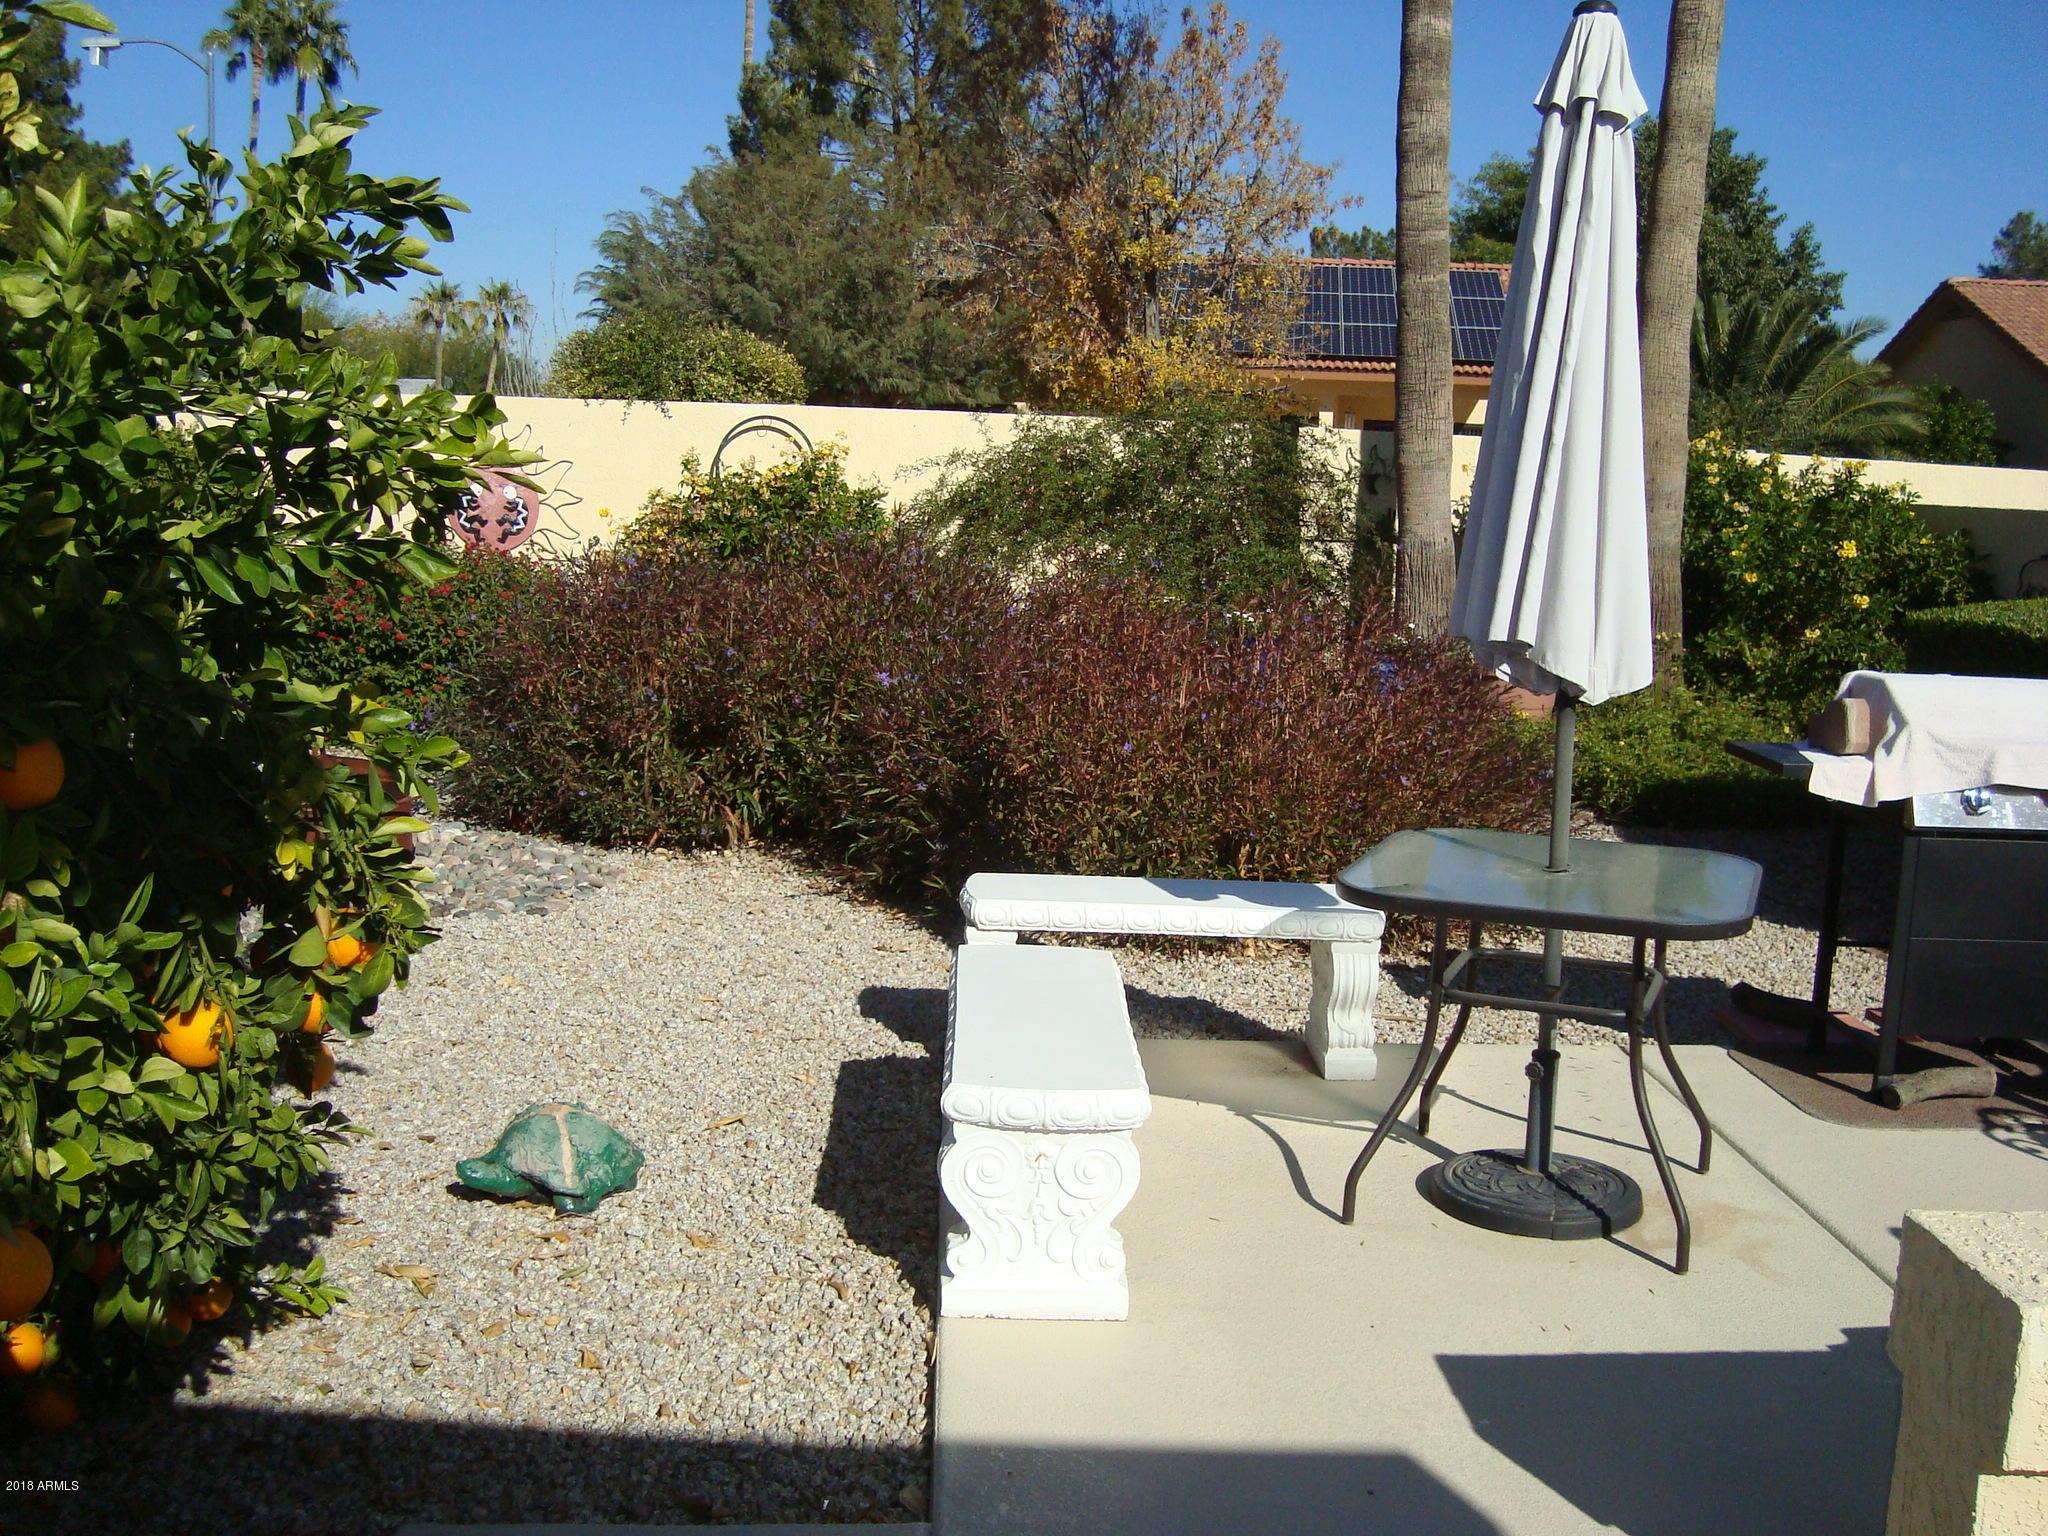 MLS 5859436 20019 N ASCOT Drive, Sun City West, AZ 85375 Sun City West AZ Condo or Townhome